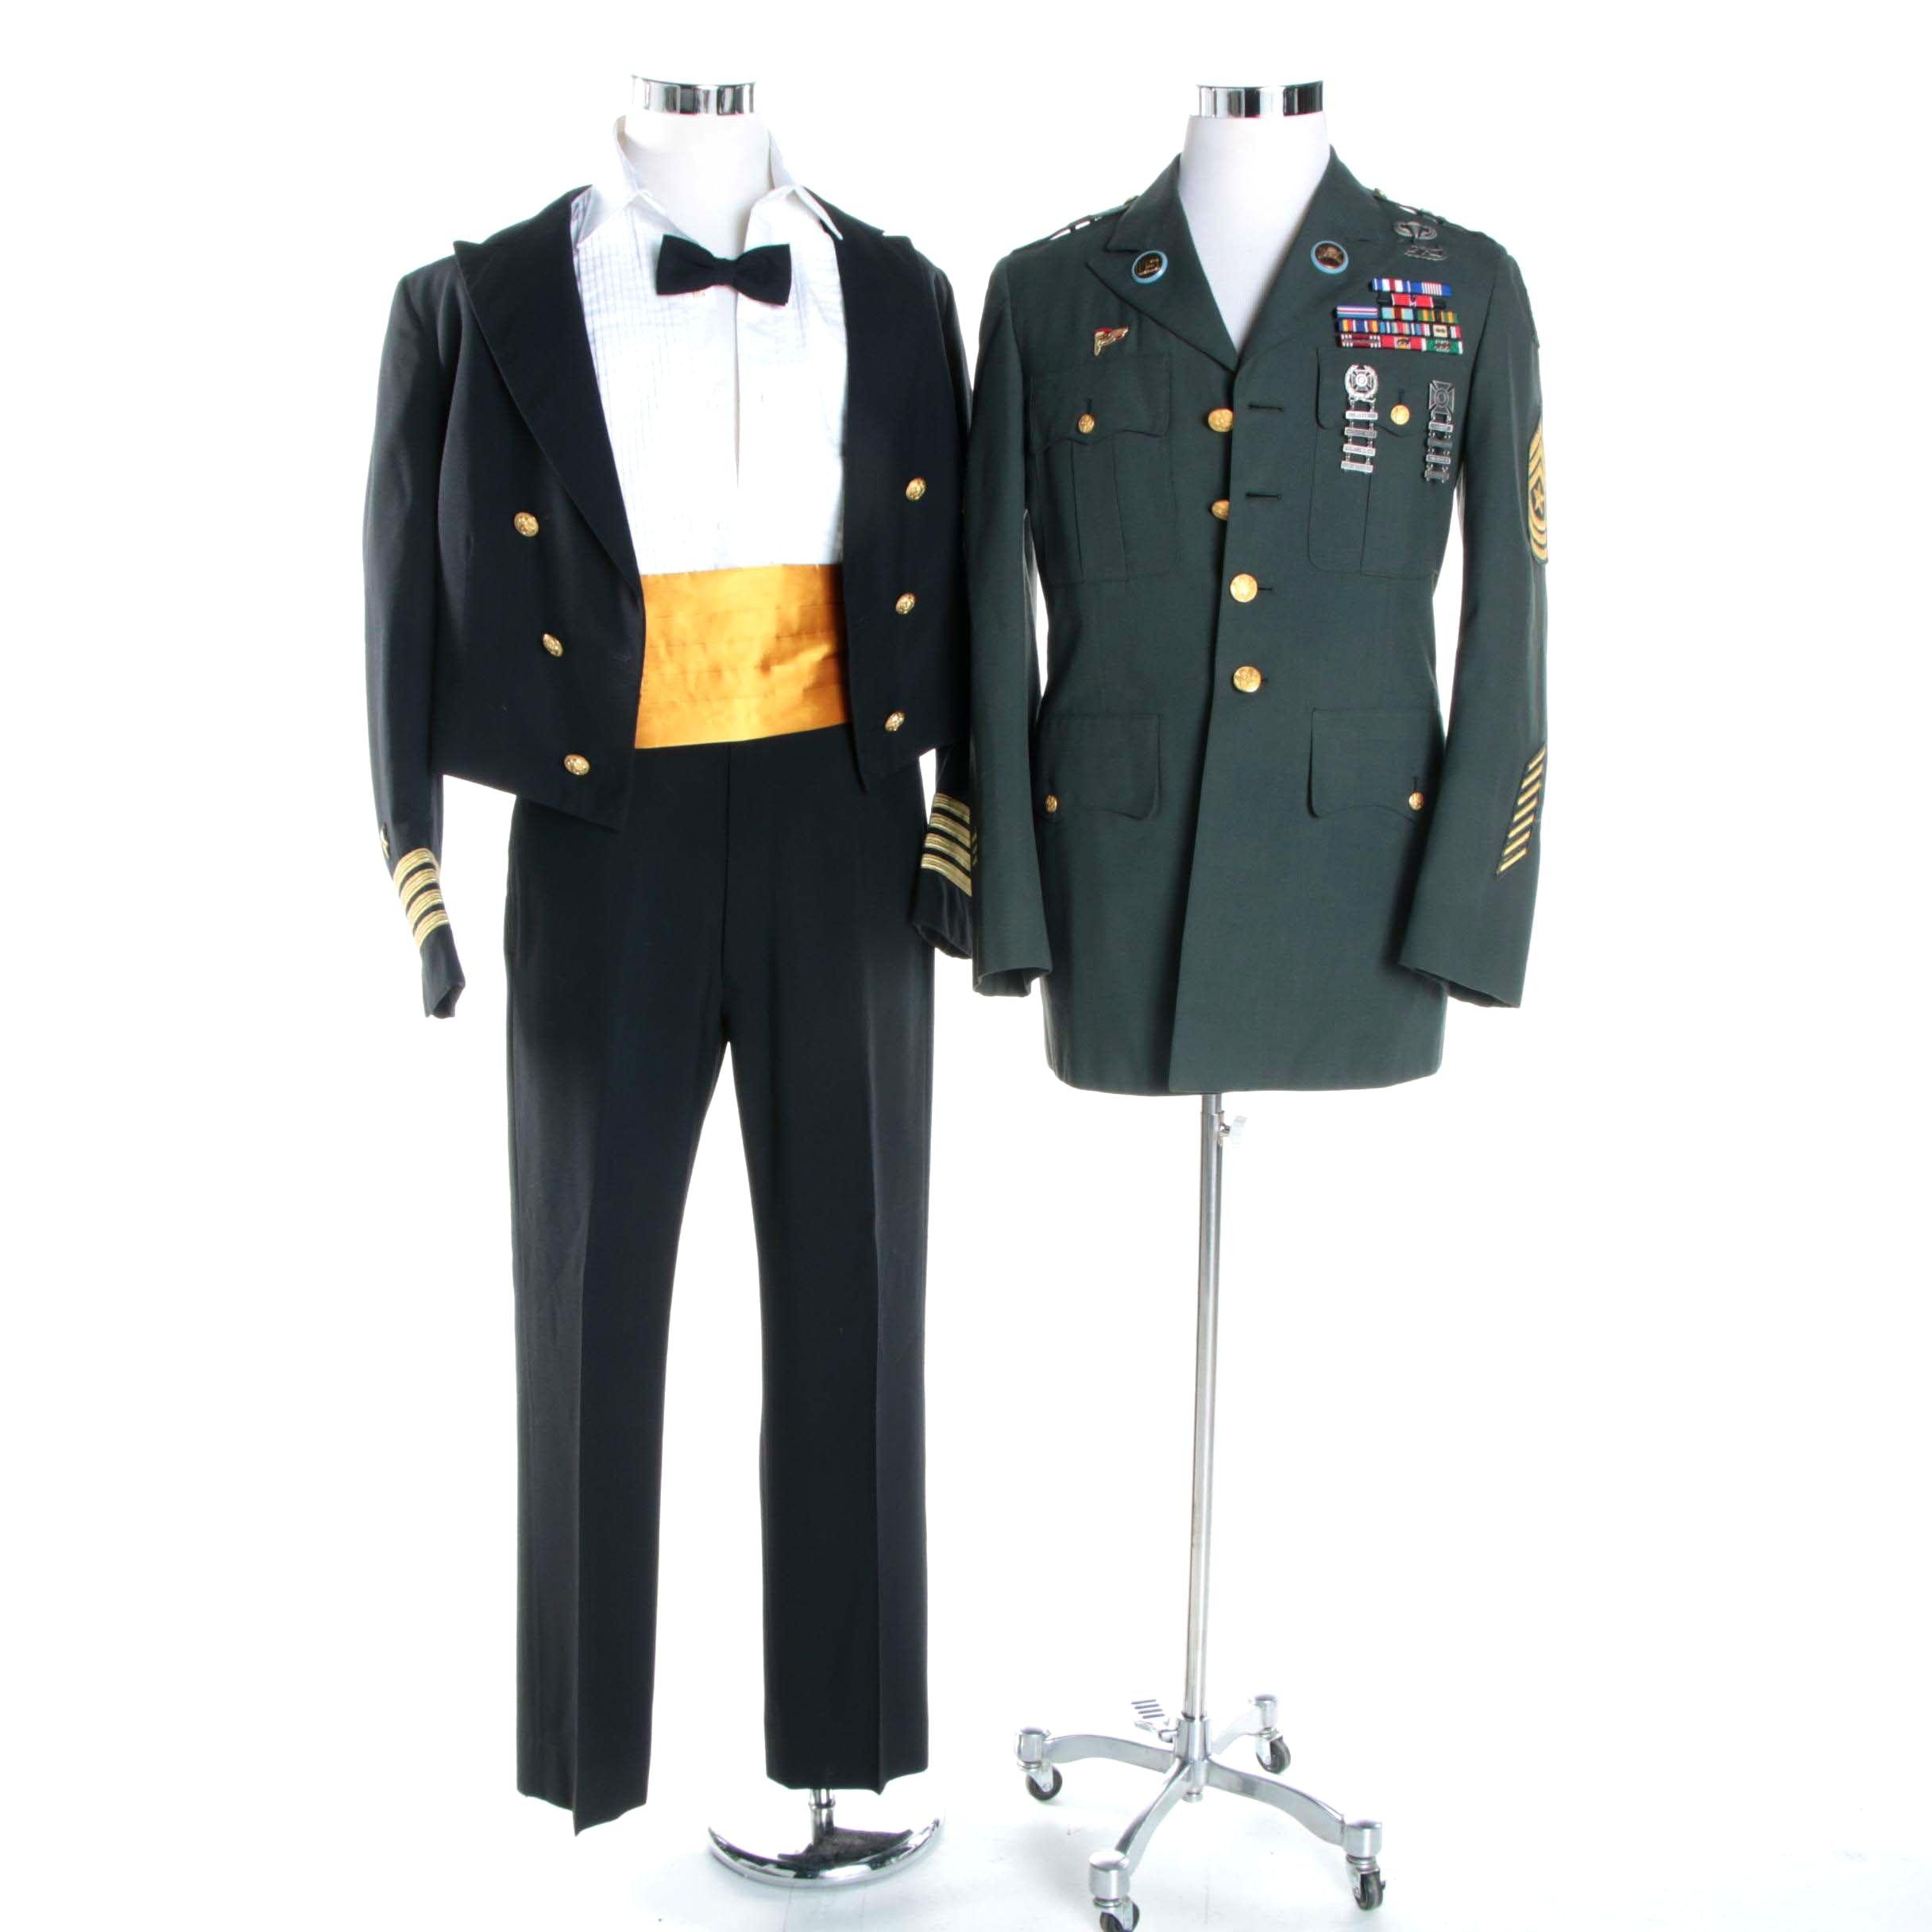 Men's Vintage U.S. Army Uniform Jacket and Navy Formal Uniform